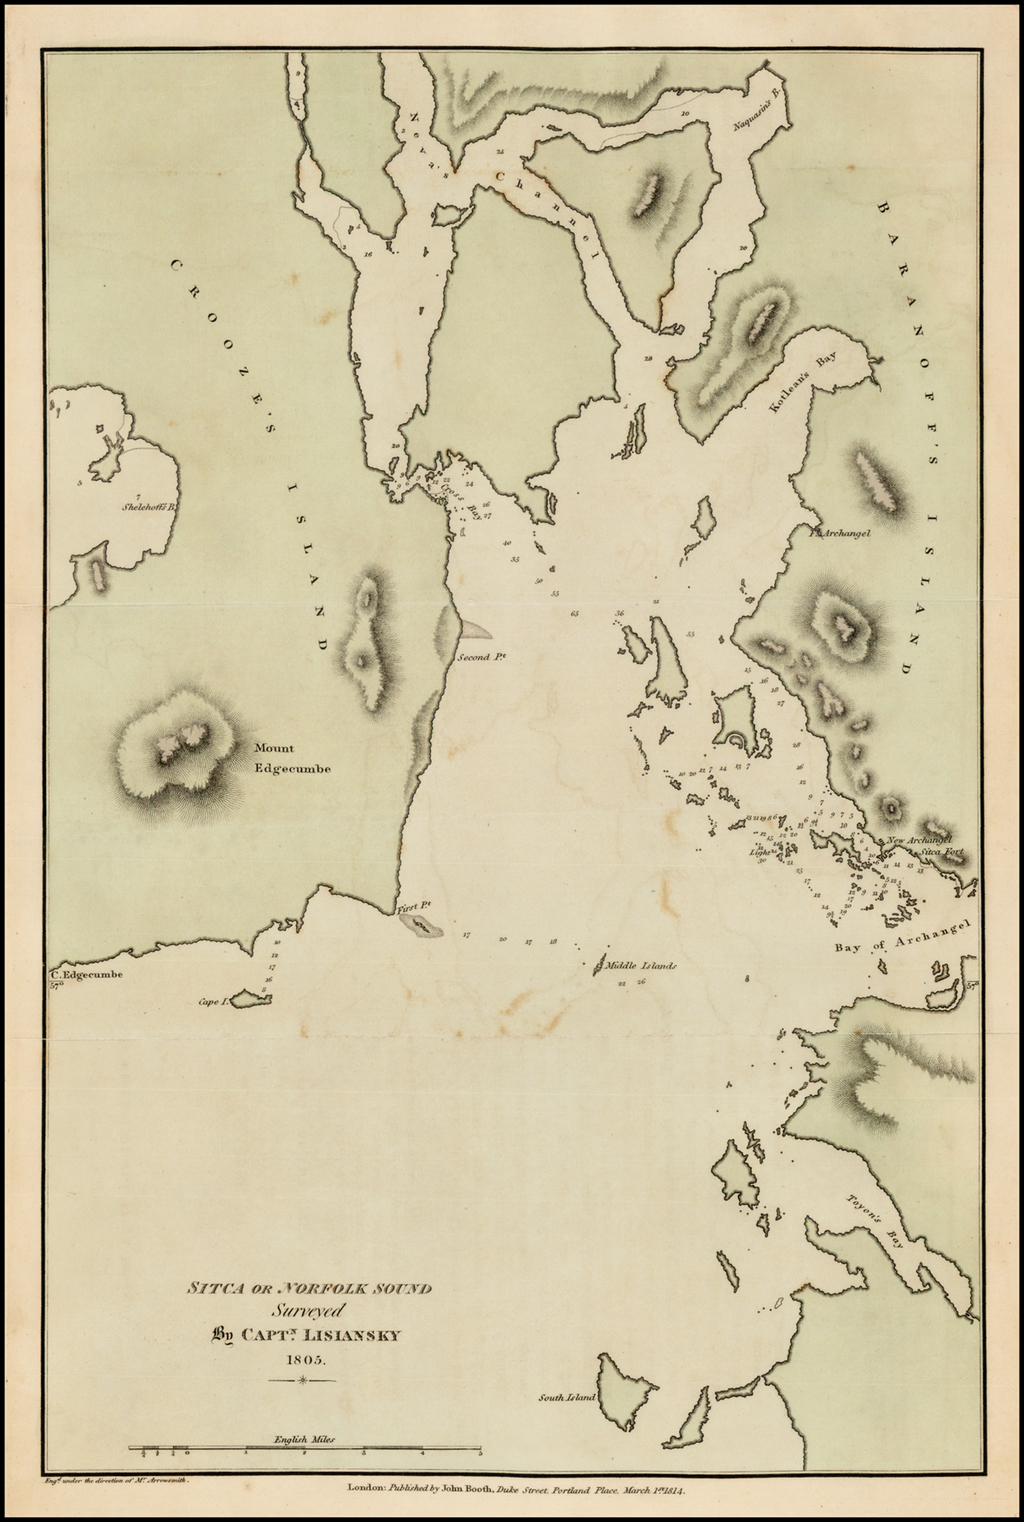 Sitca or Norfolk Sound Surveyed By Captn. Lisiansky 1805 By Yuri Federovich Lisiansky